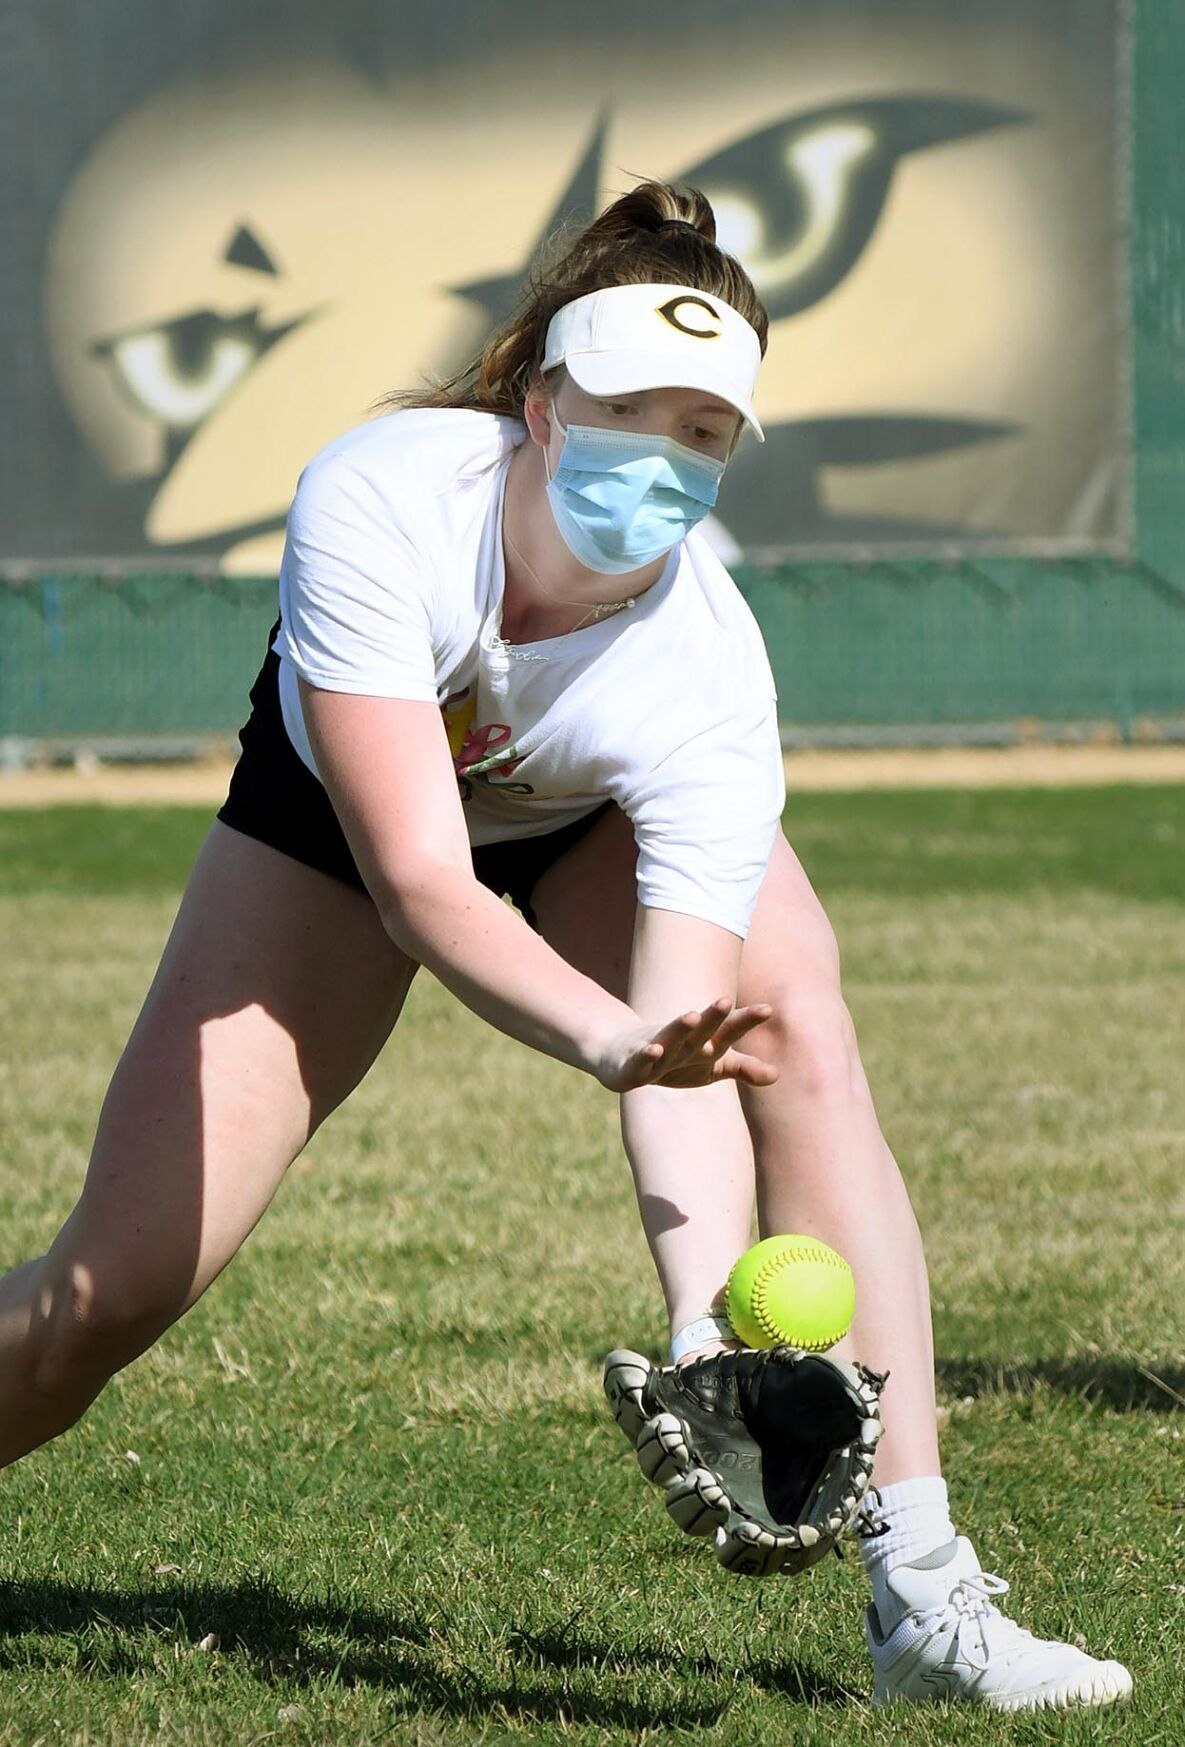 East softball practice 4-7